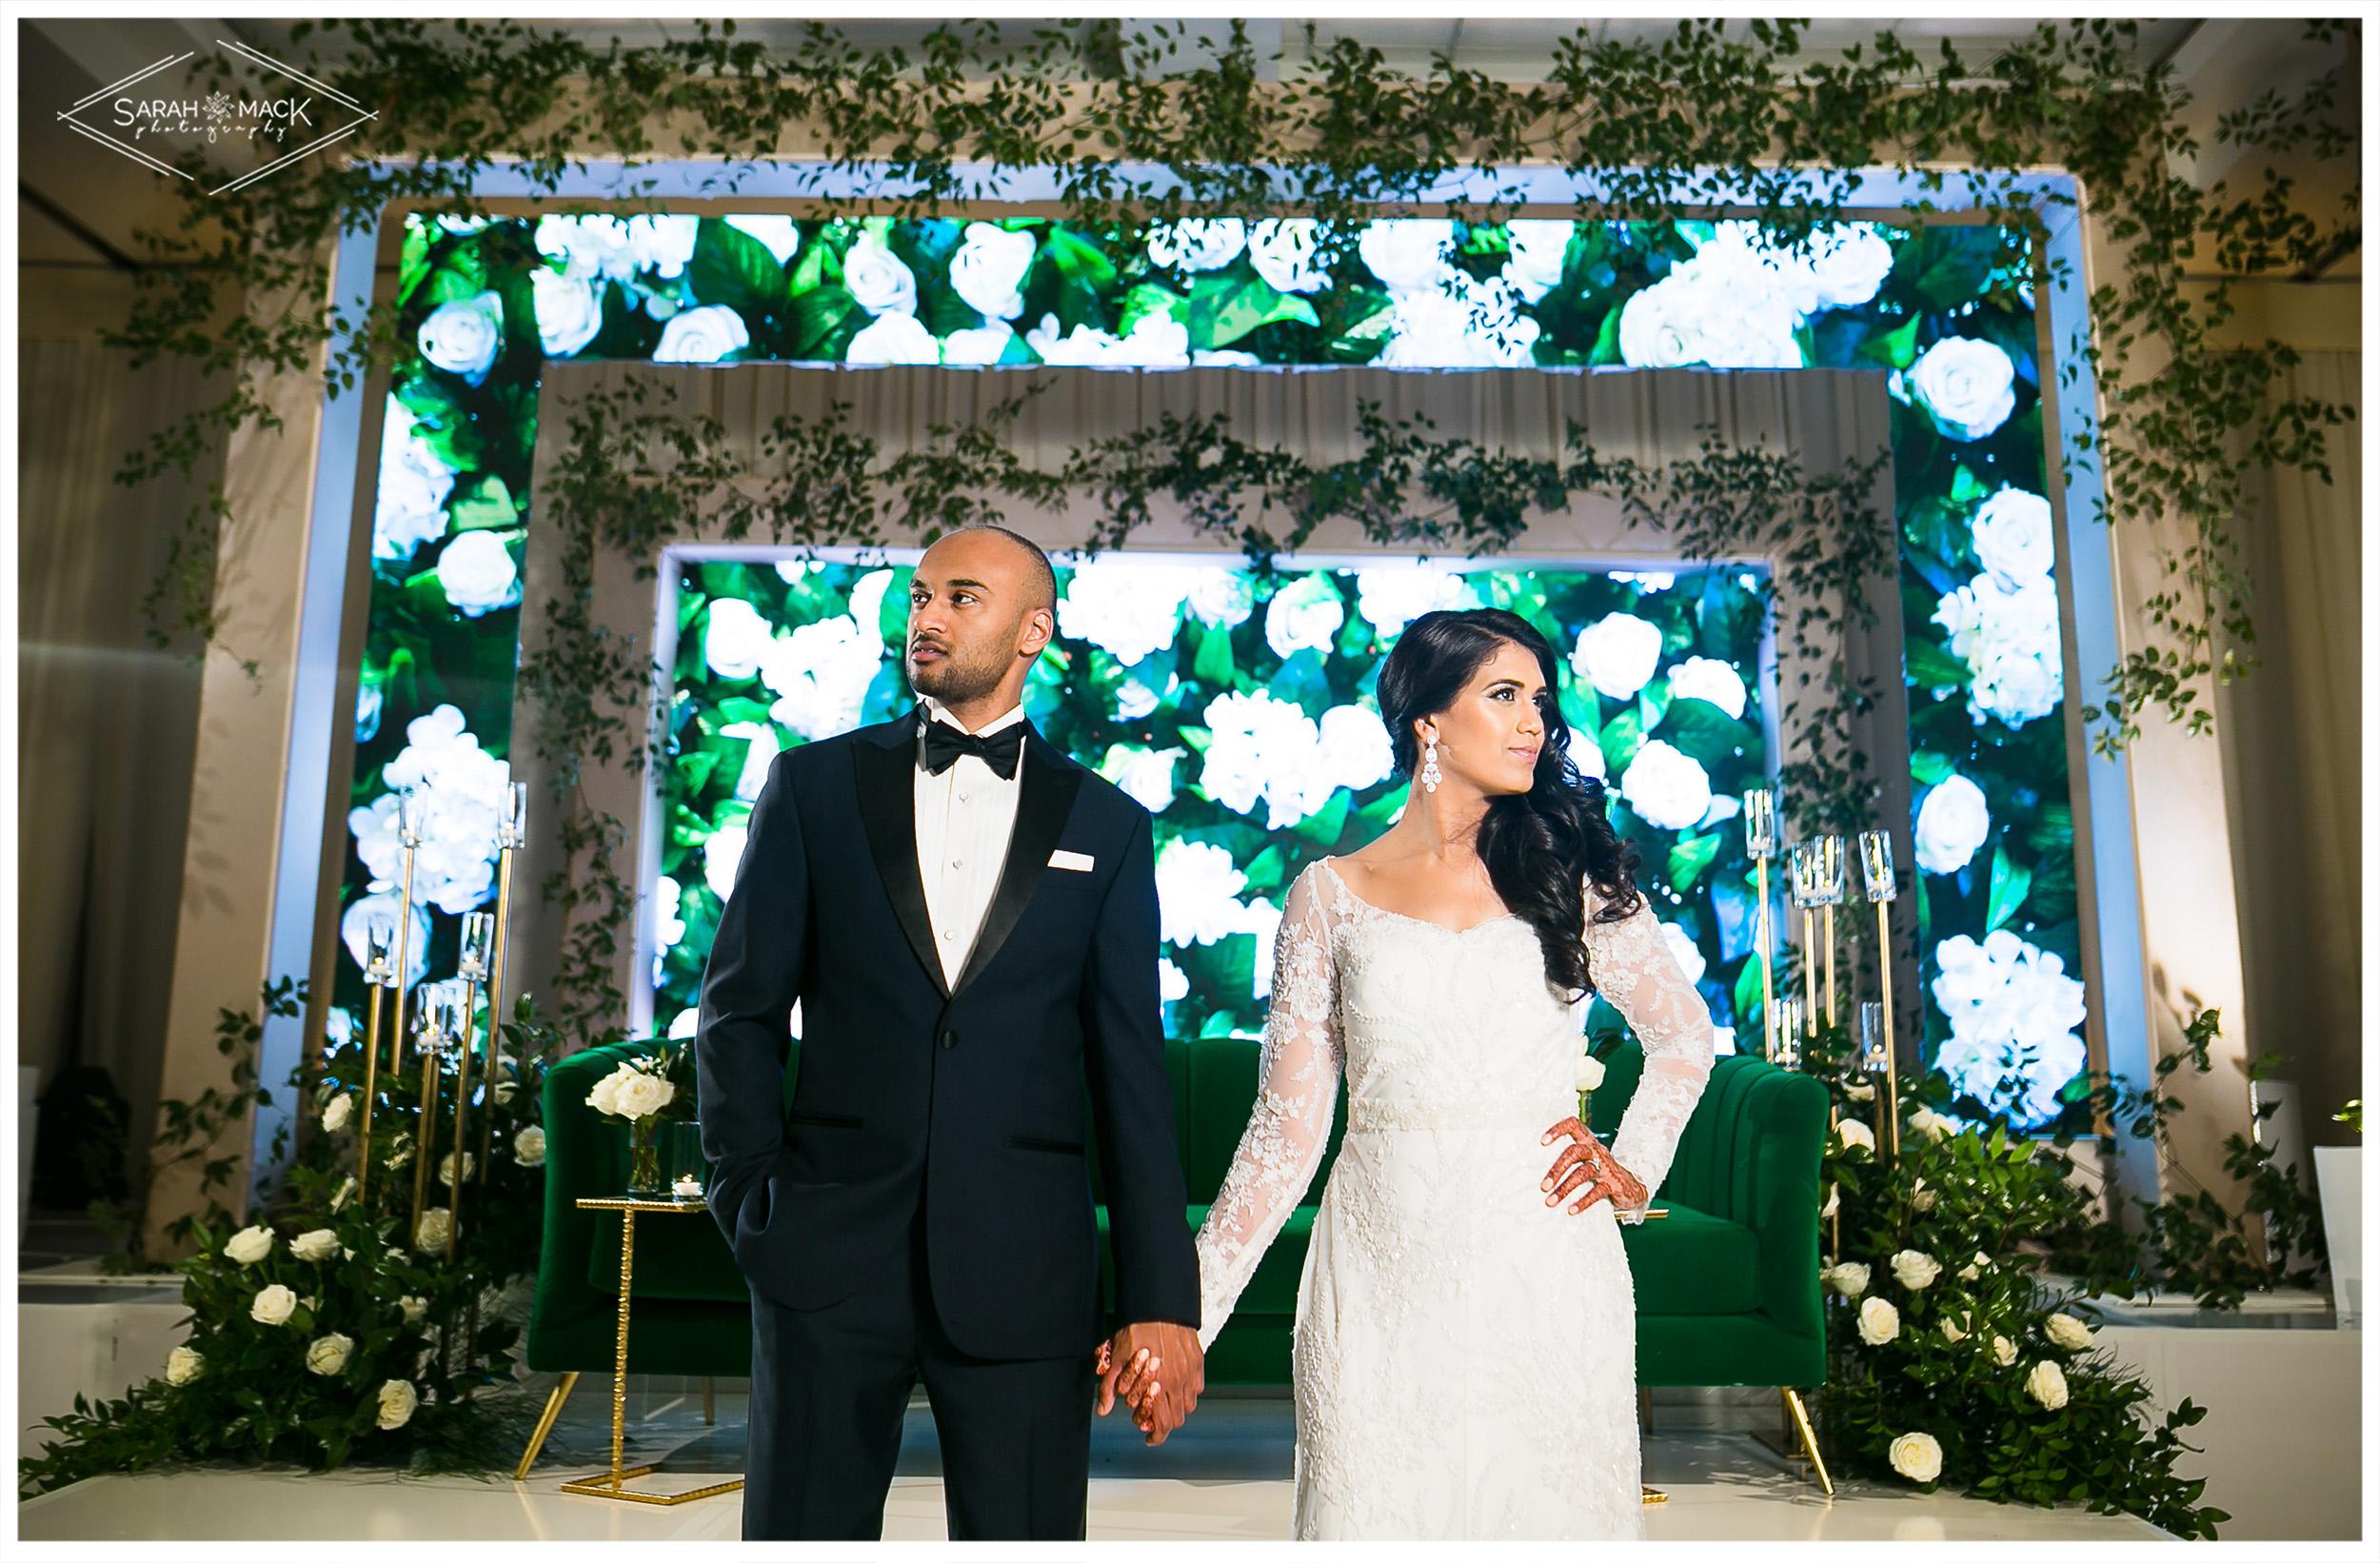 PR-Double-Tree-Hilton-Palm-Springs-Indian-Wedding-67.jpg